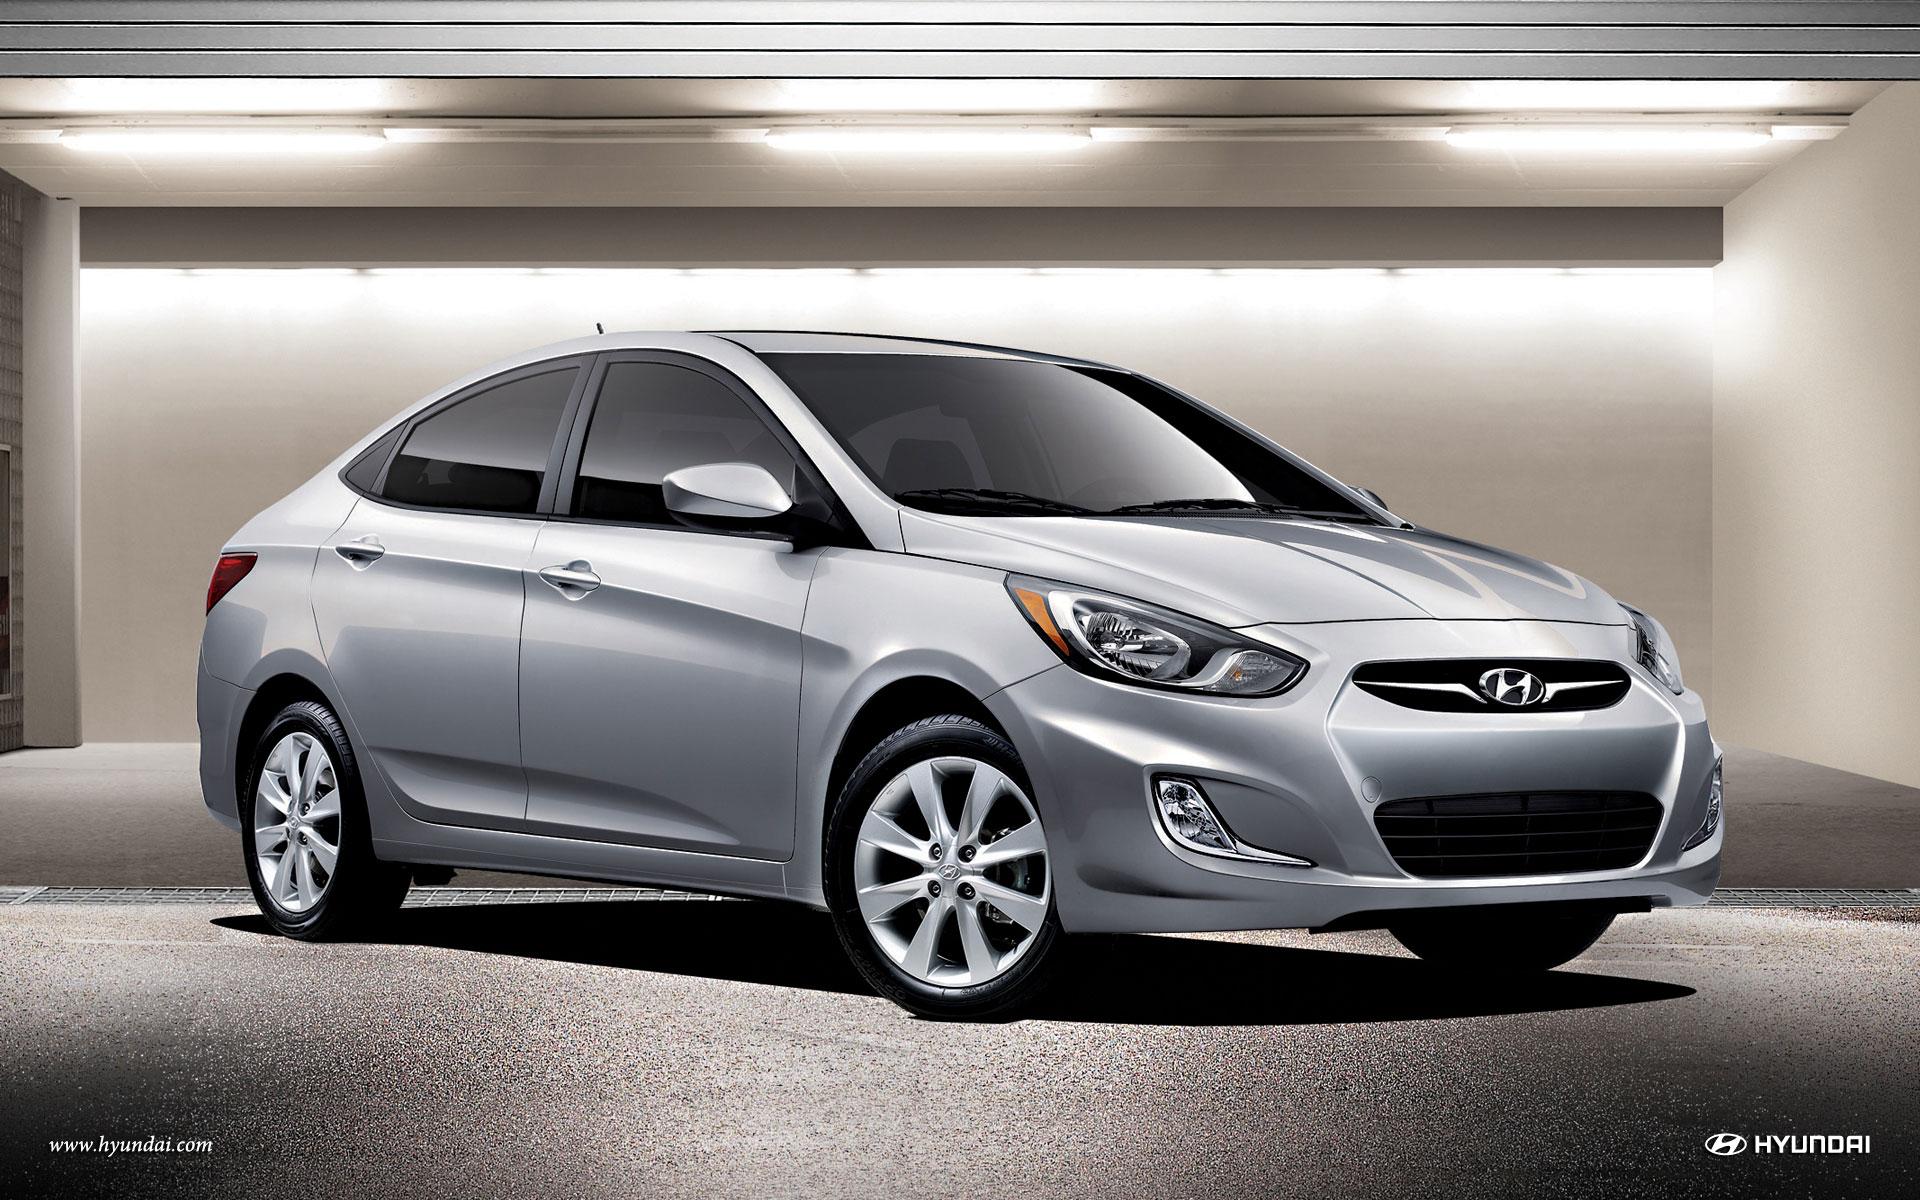 Accent Parts | Hyundai Accent Replacet Parts | hyundaiparts